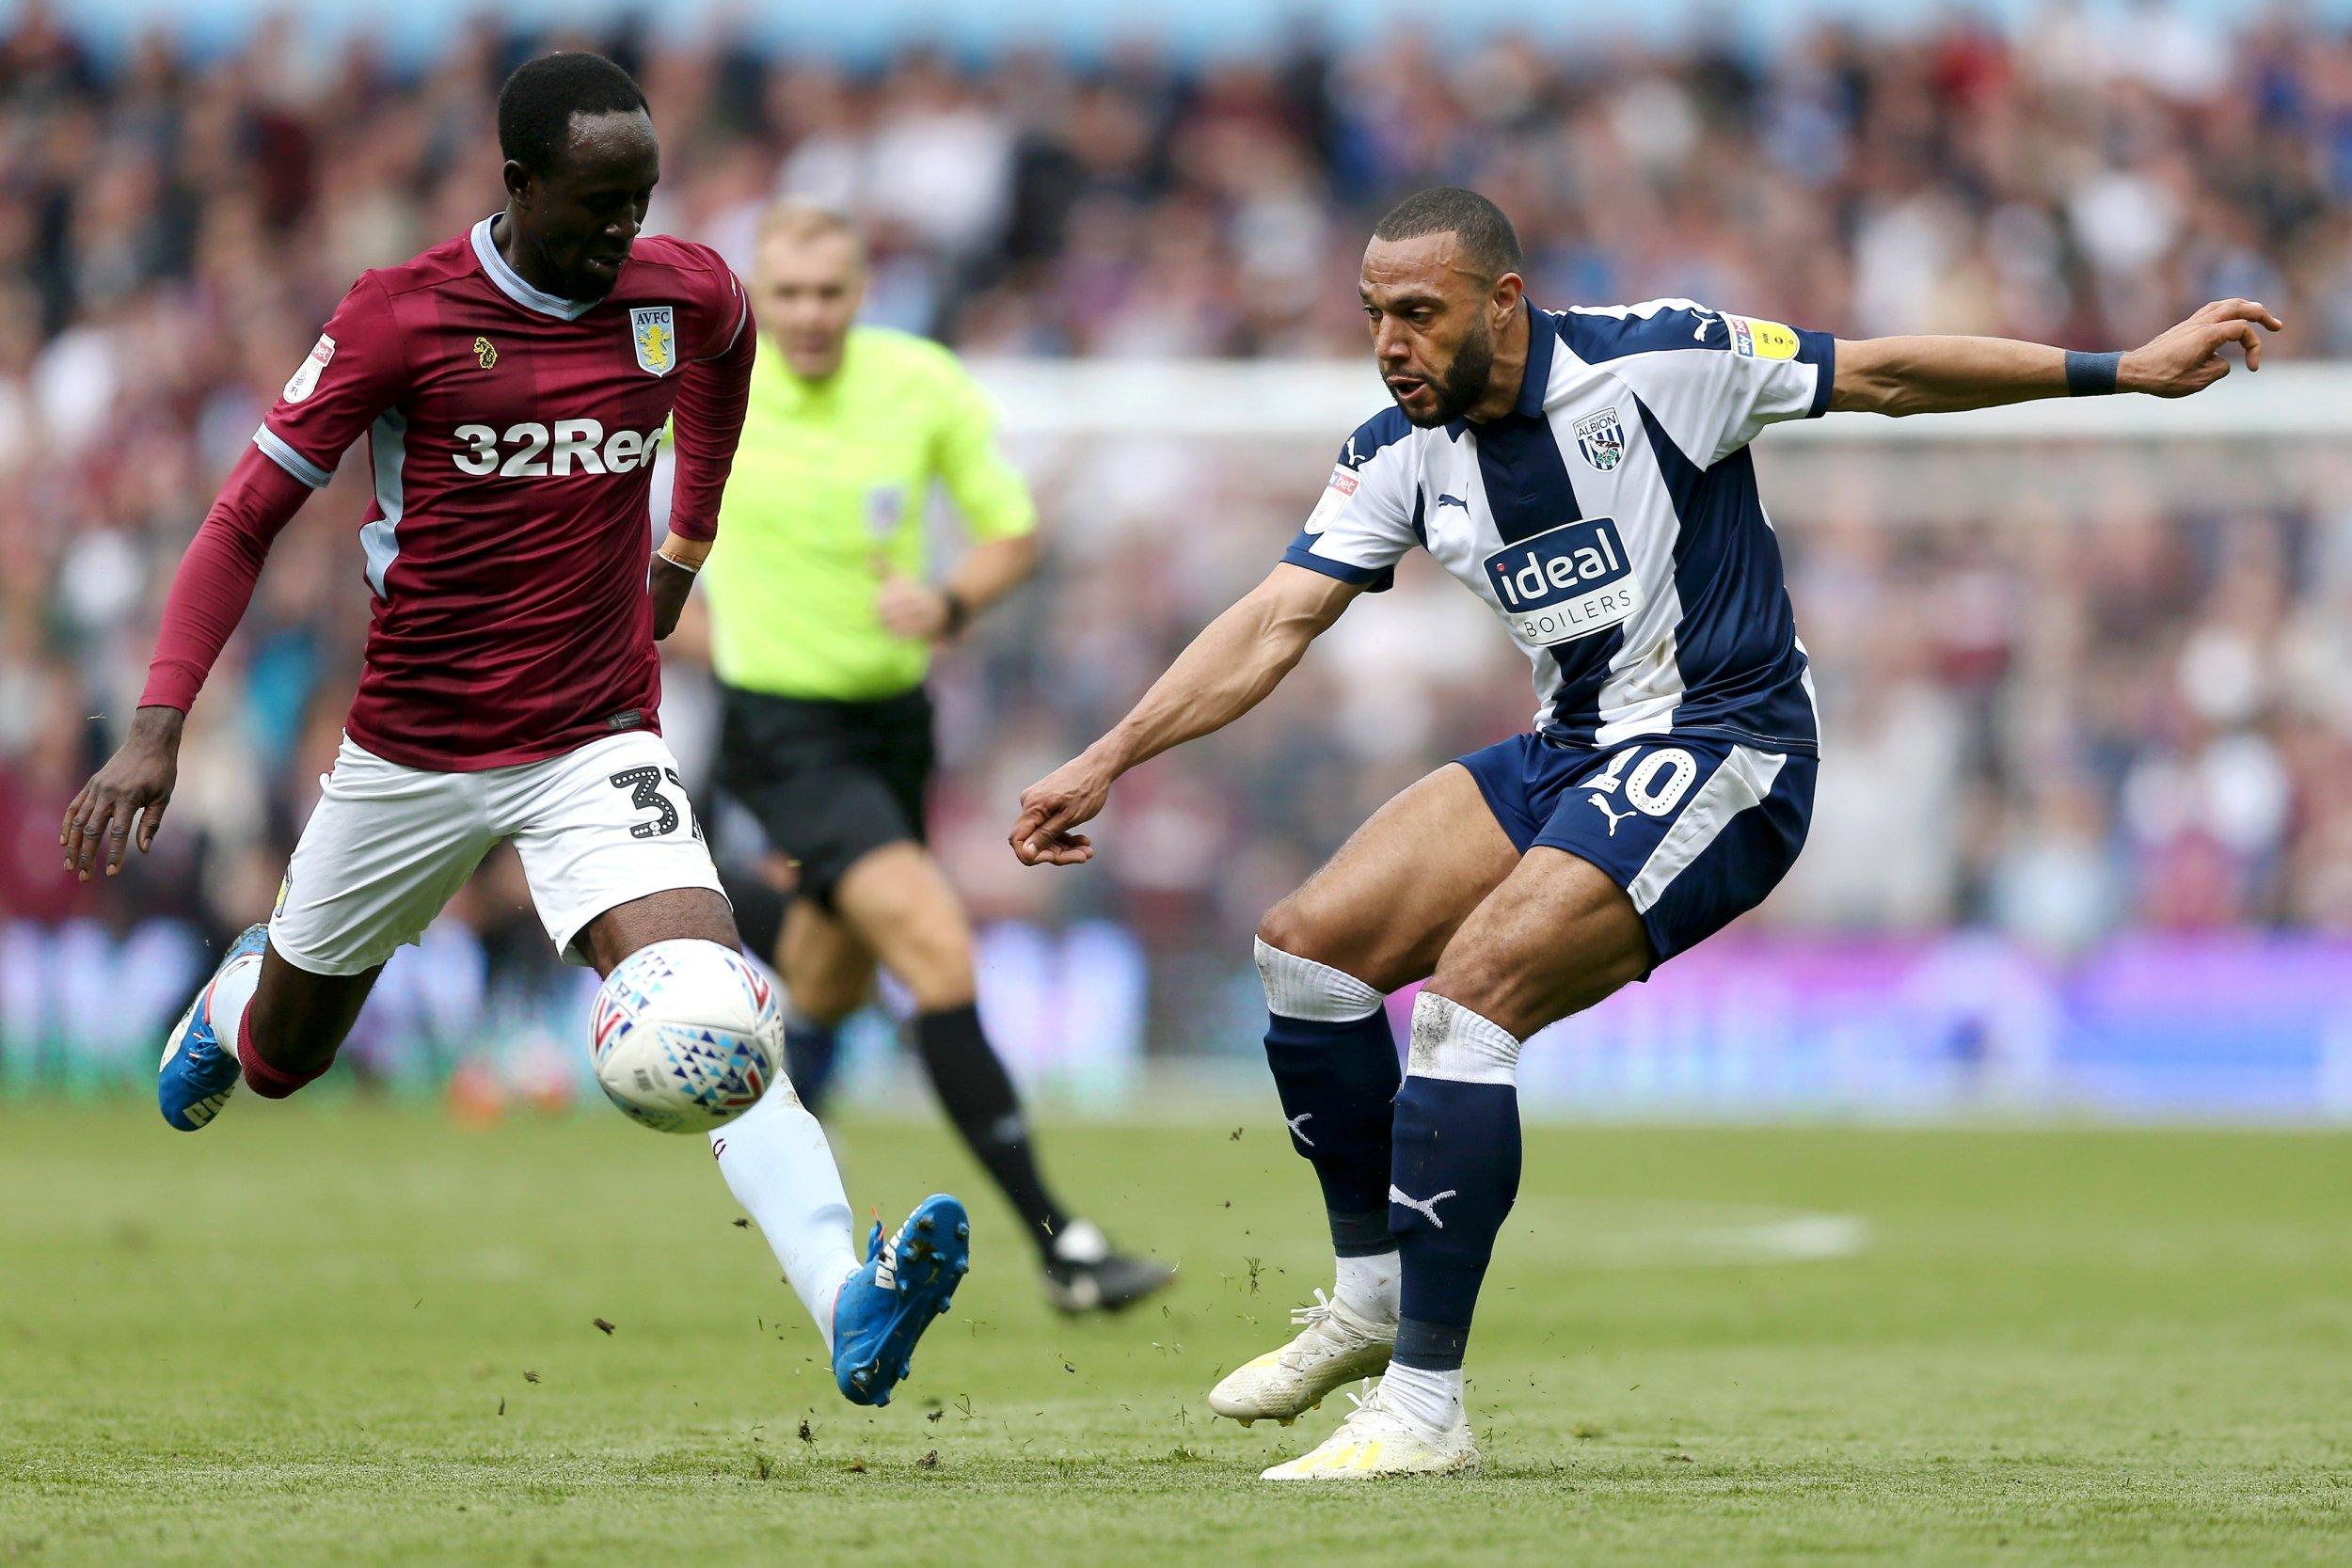 Albert Adomah v Matt Phillips Aston Villa 2 - 1 West Bromwich Albion